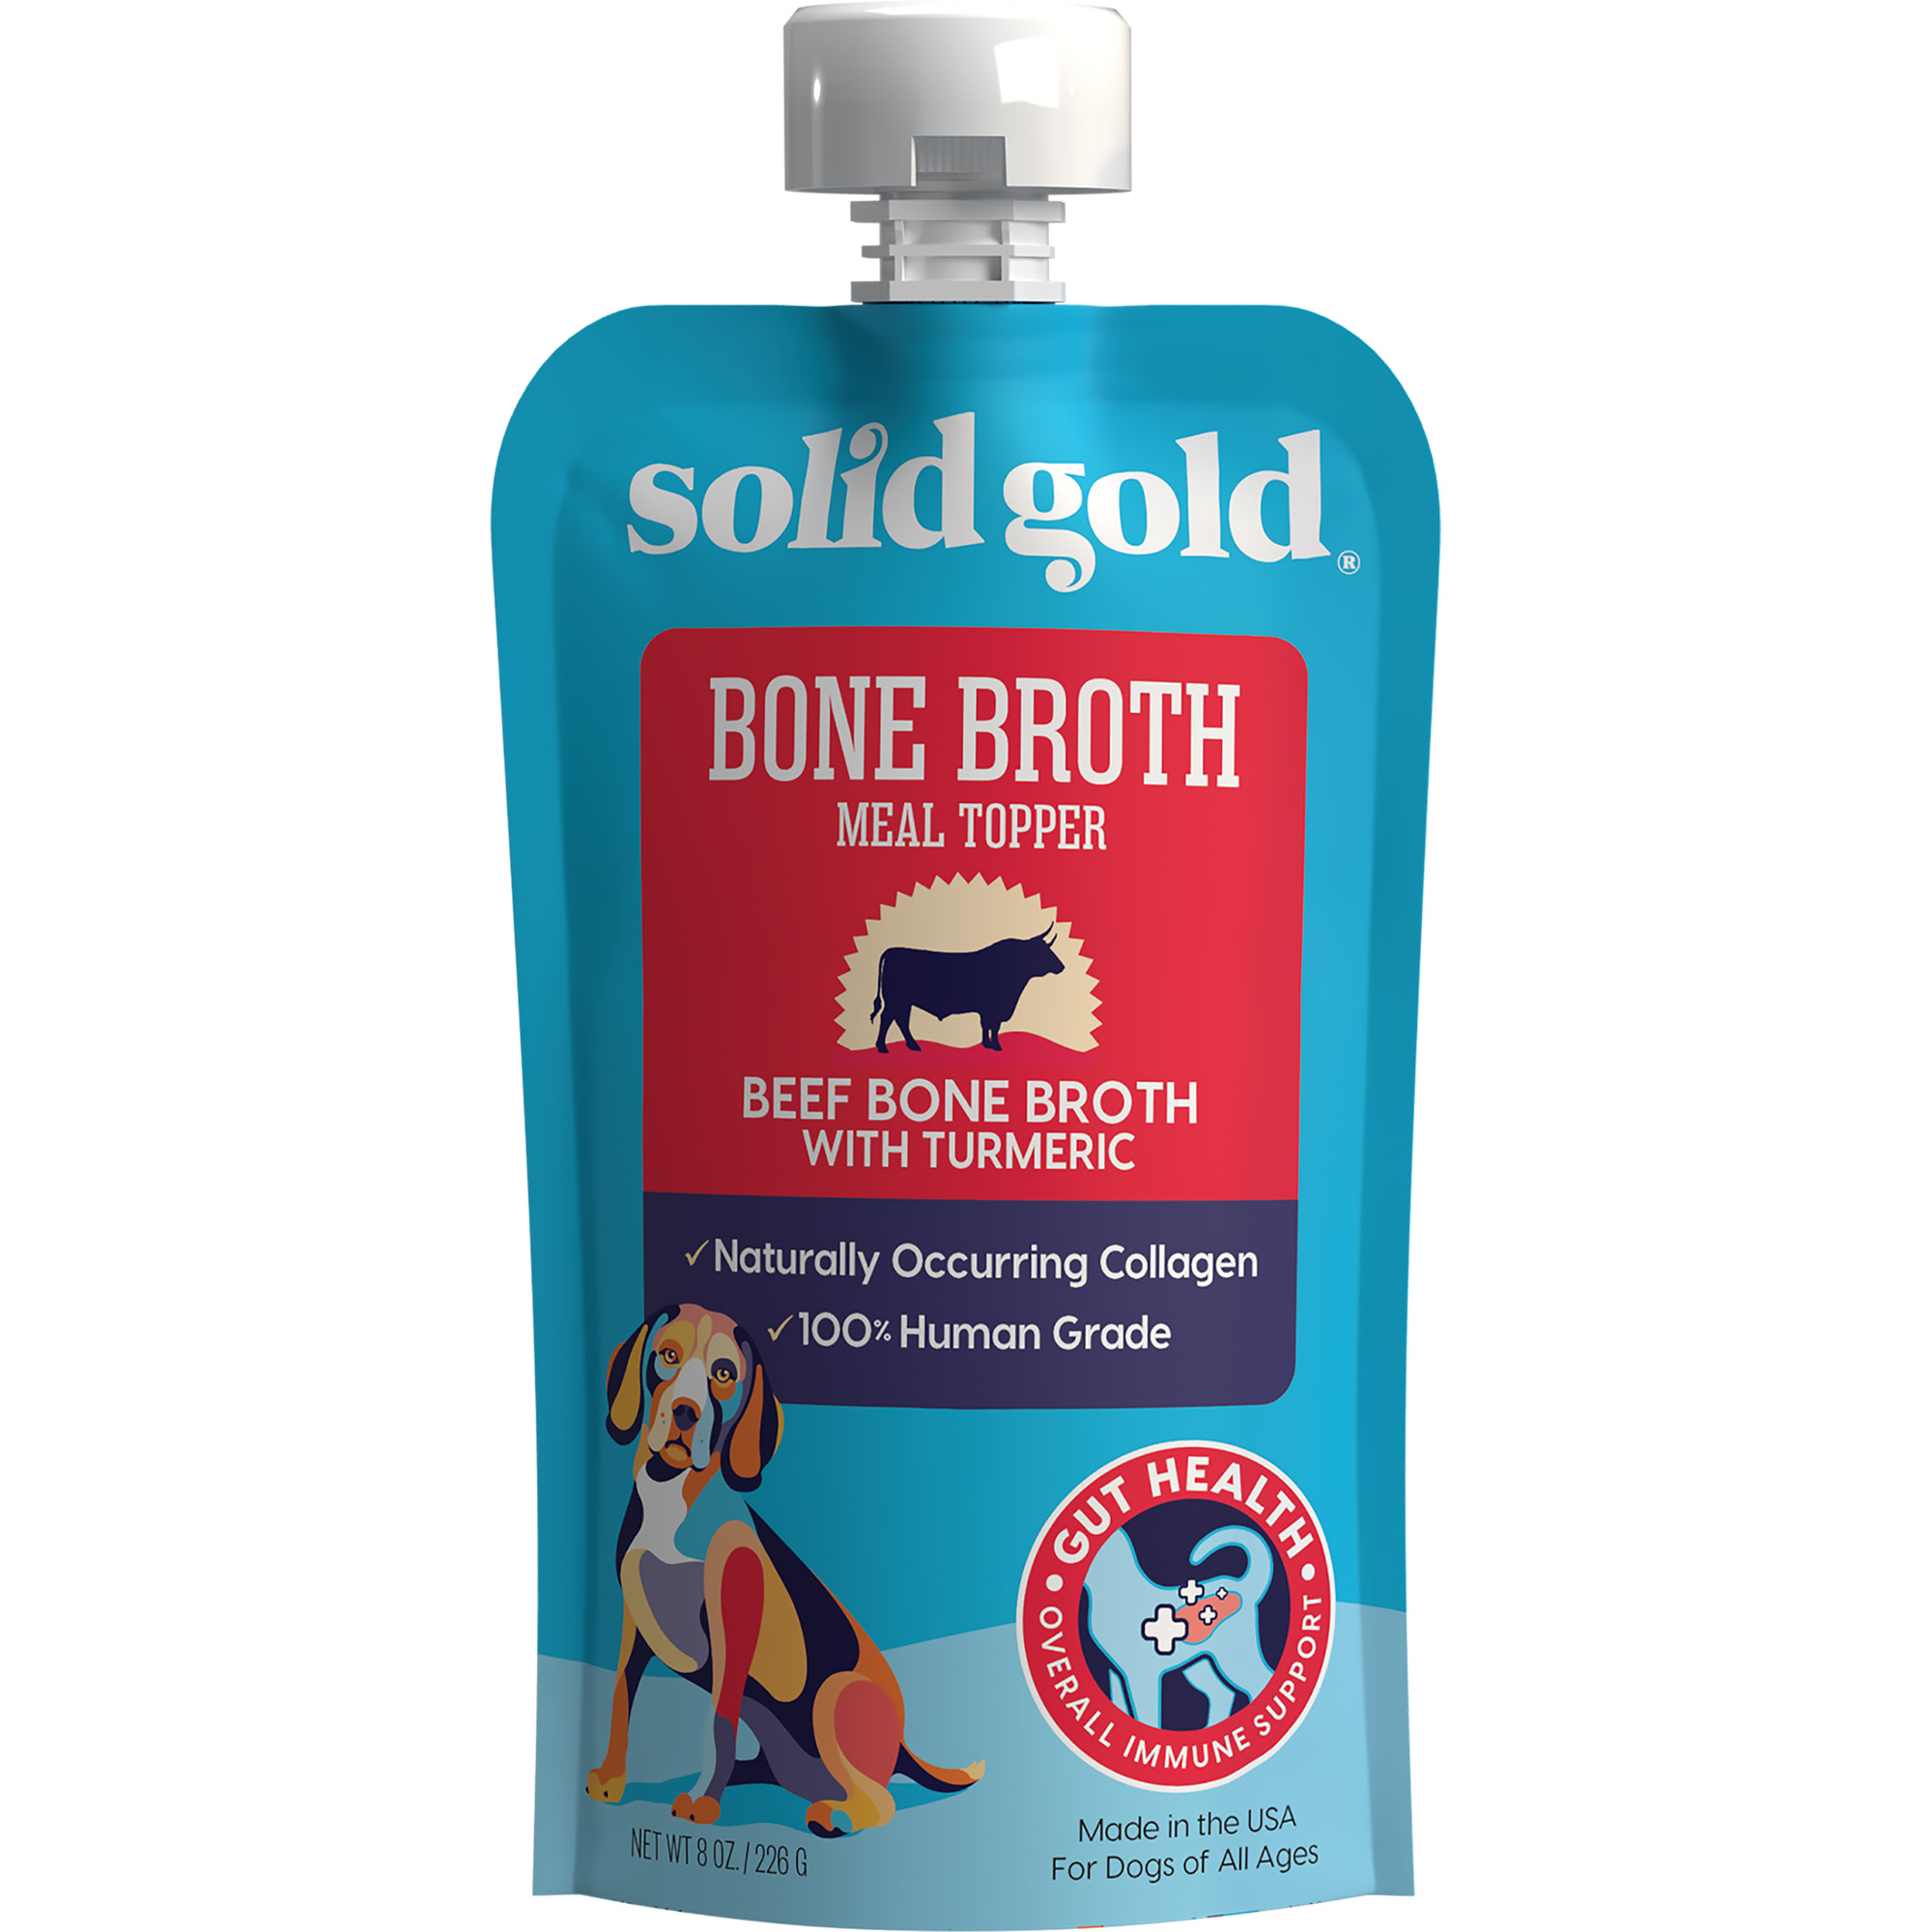 Solid gold bone broth topper